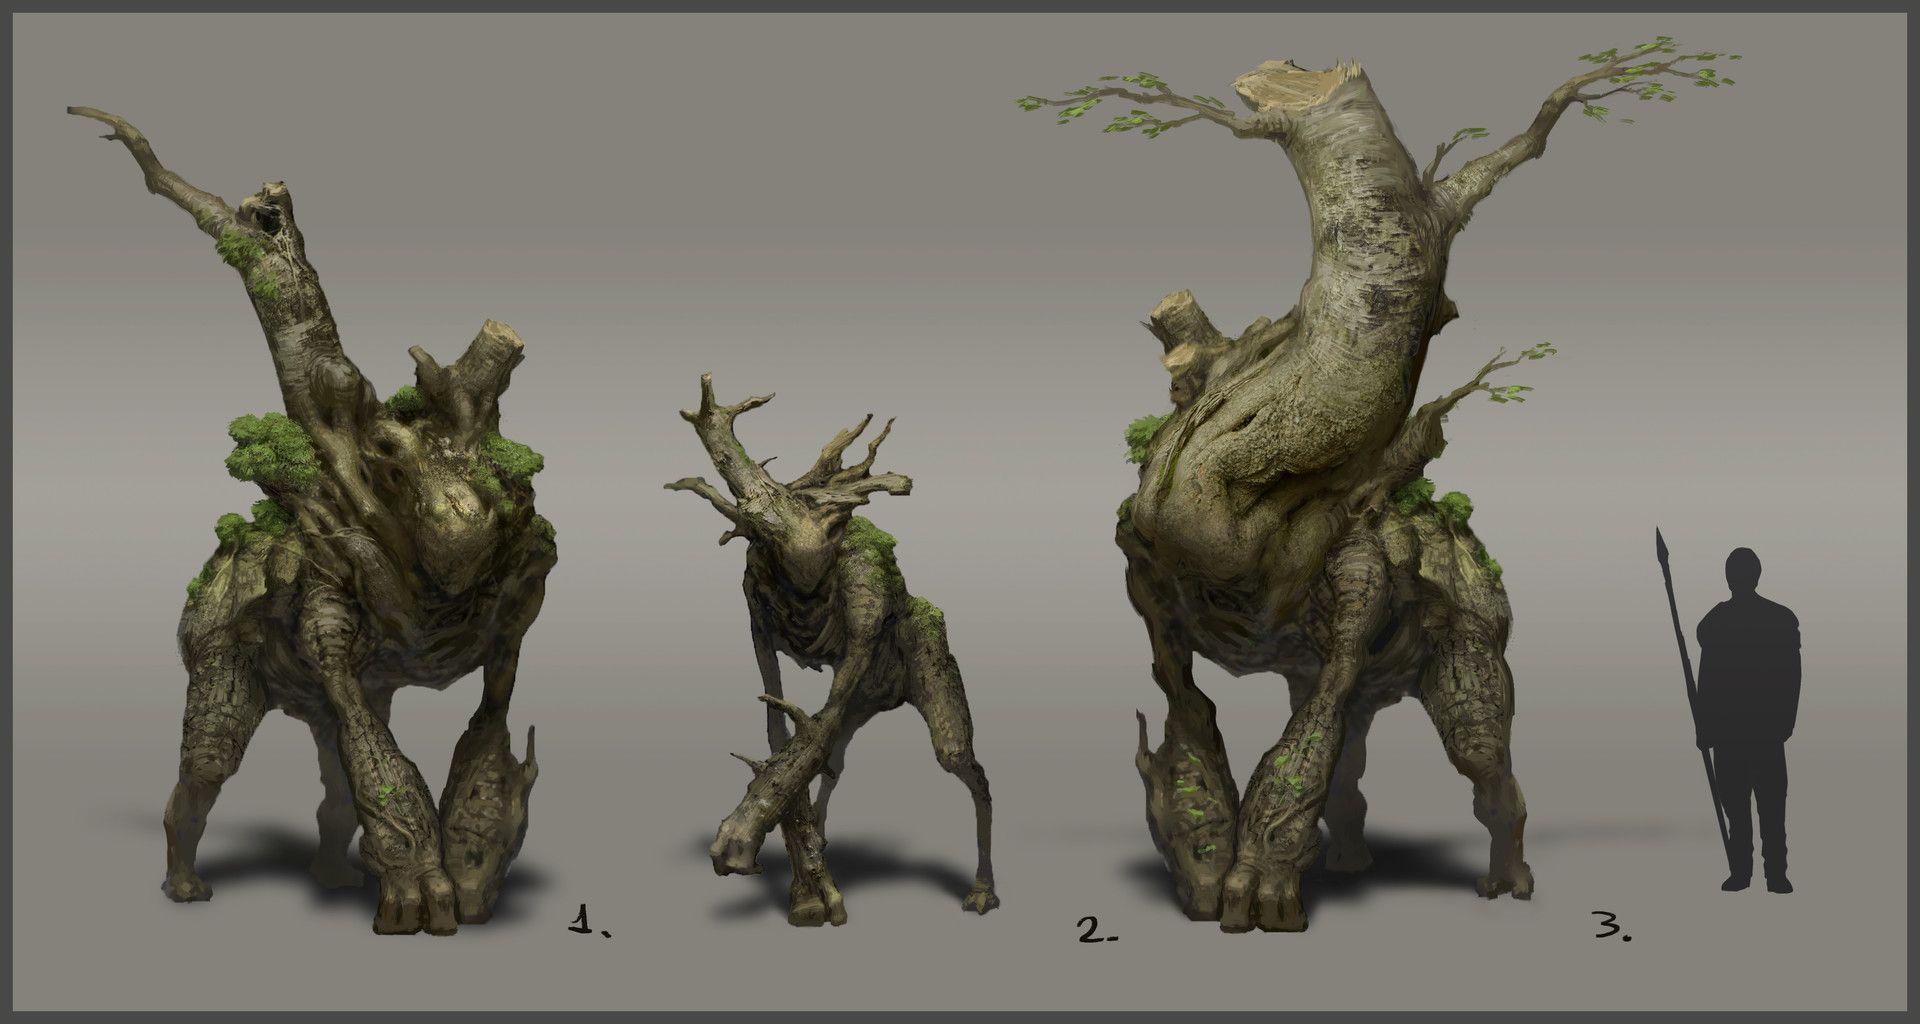 ArtStation - Forest guardian, David Masson